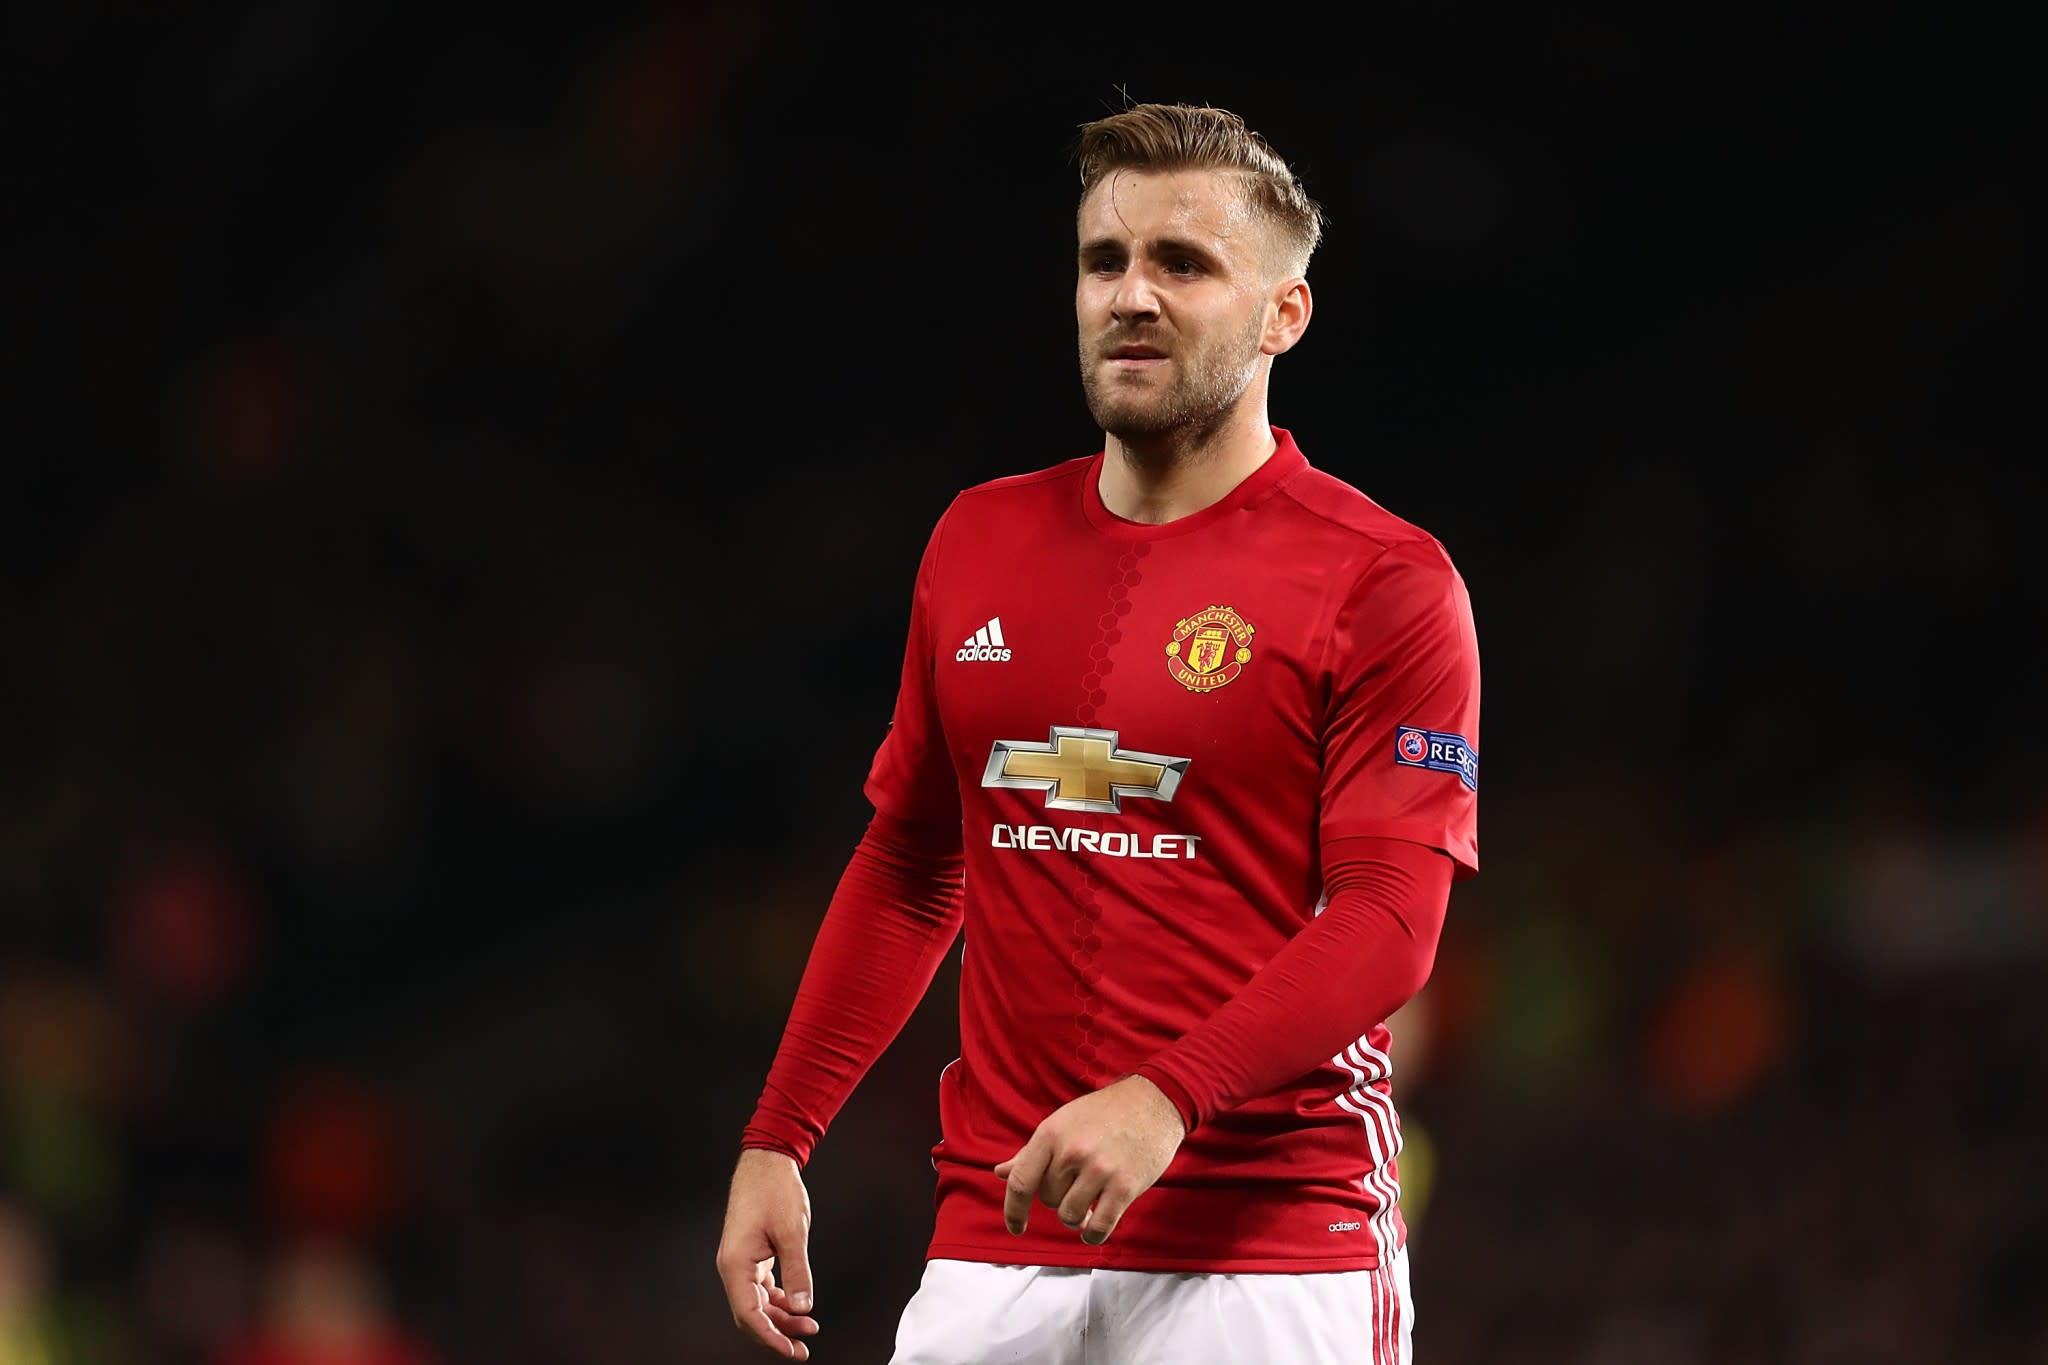 Manchester United boss Jose Mourinho categorically rules out Luke